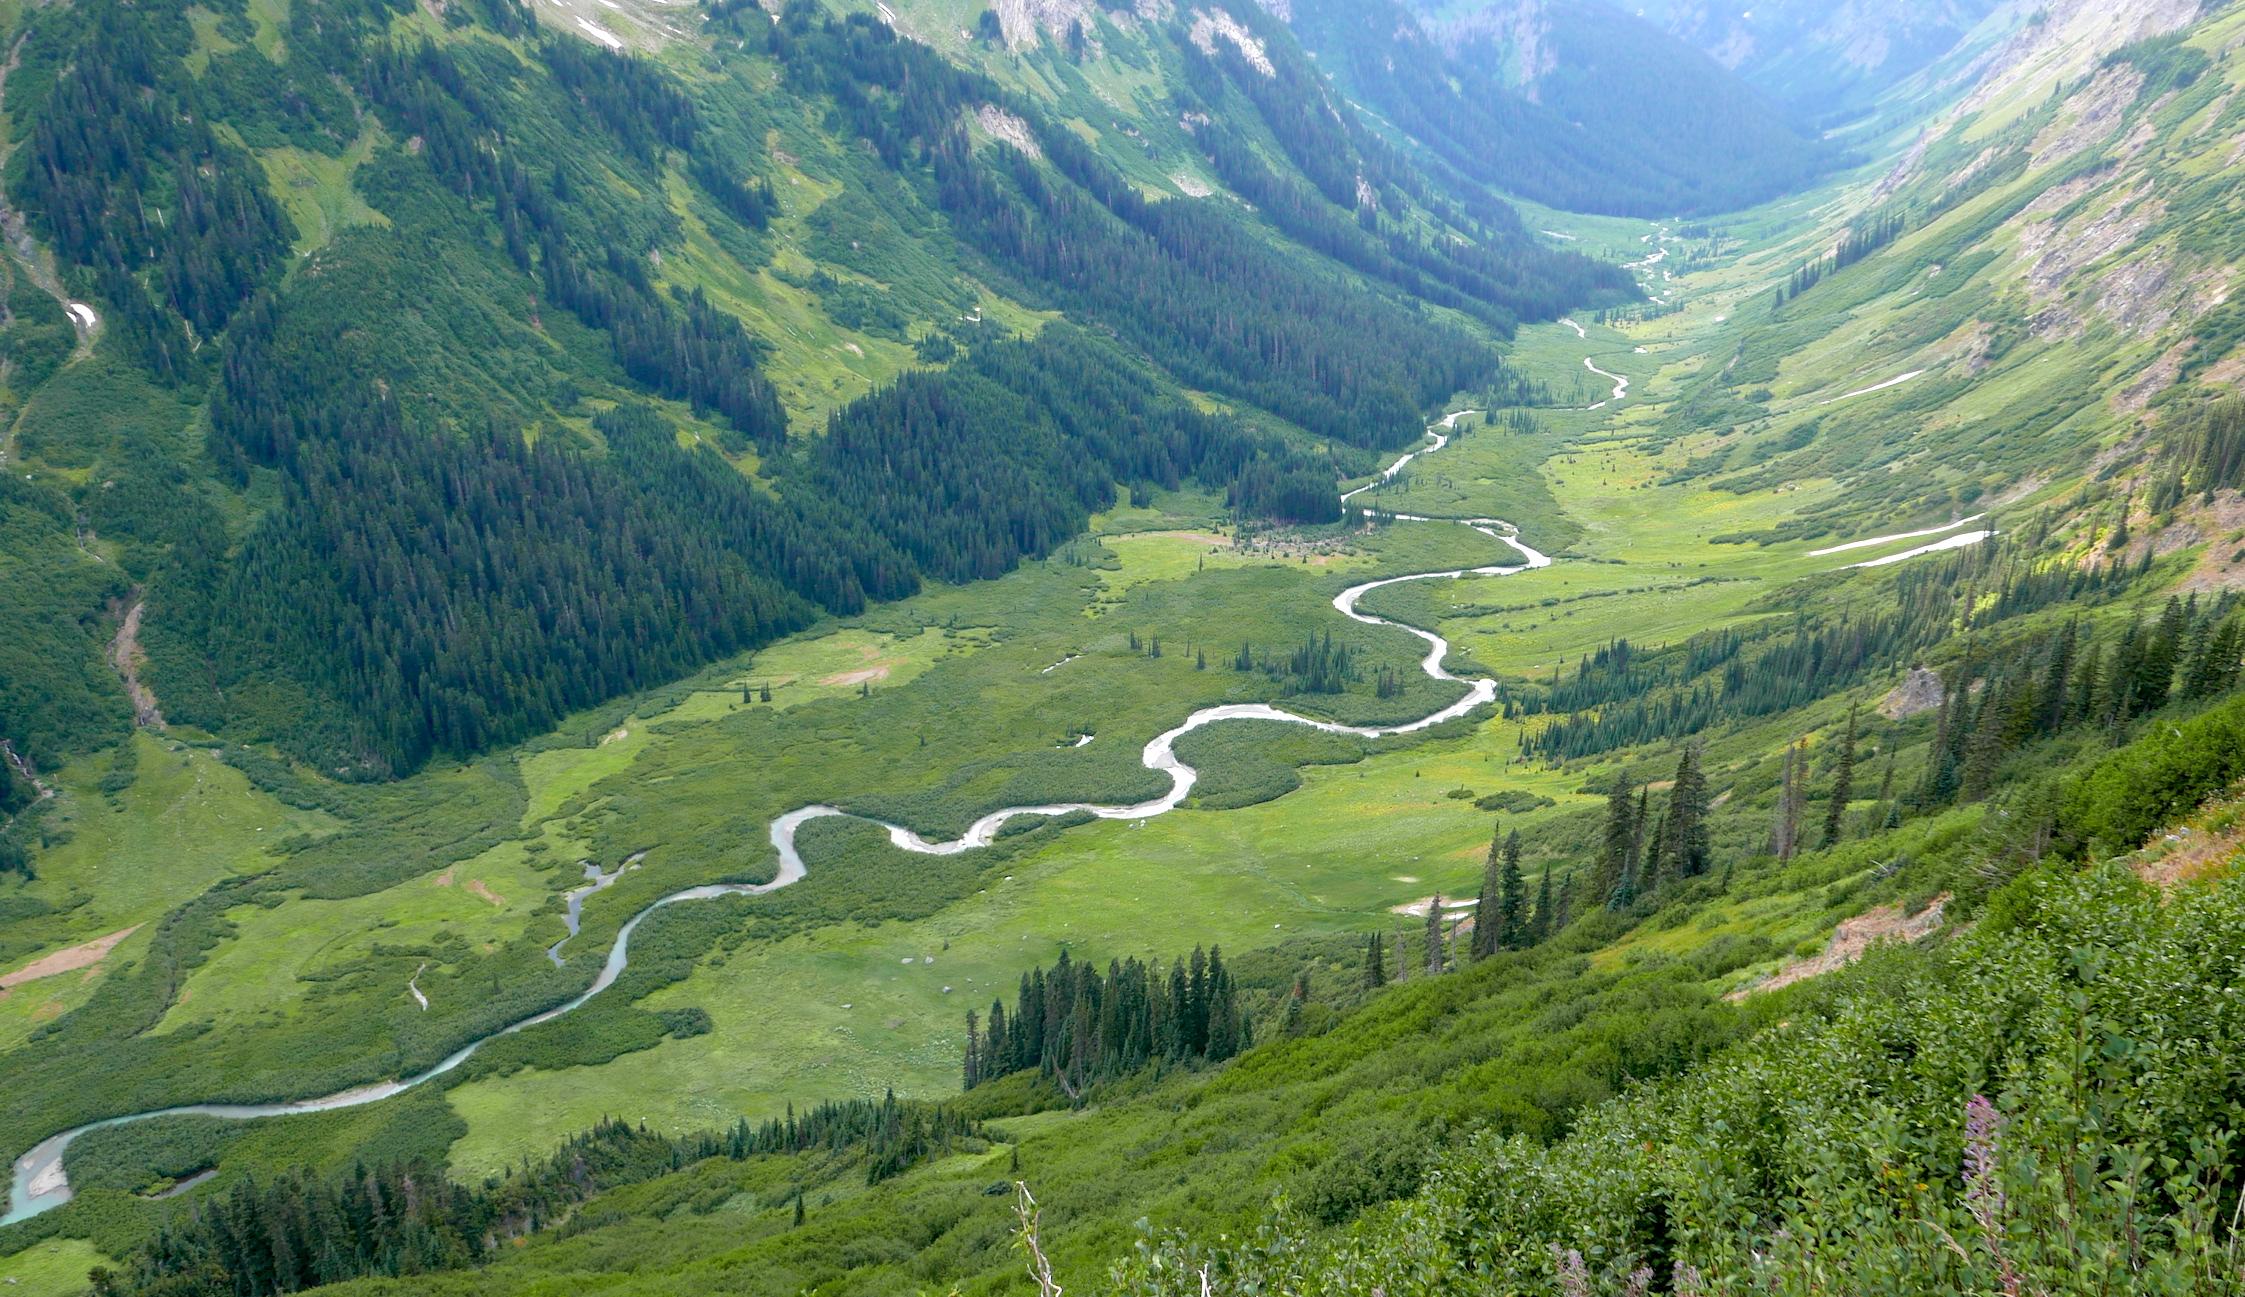 The verdant Napeequa Valley on the climb to Little Giant Pass, Glacier Peak